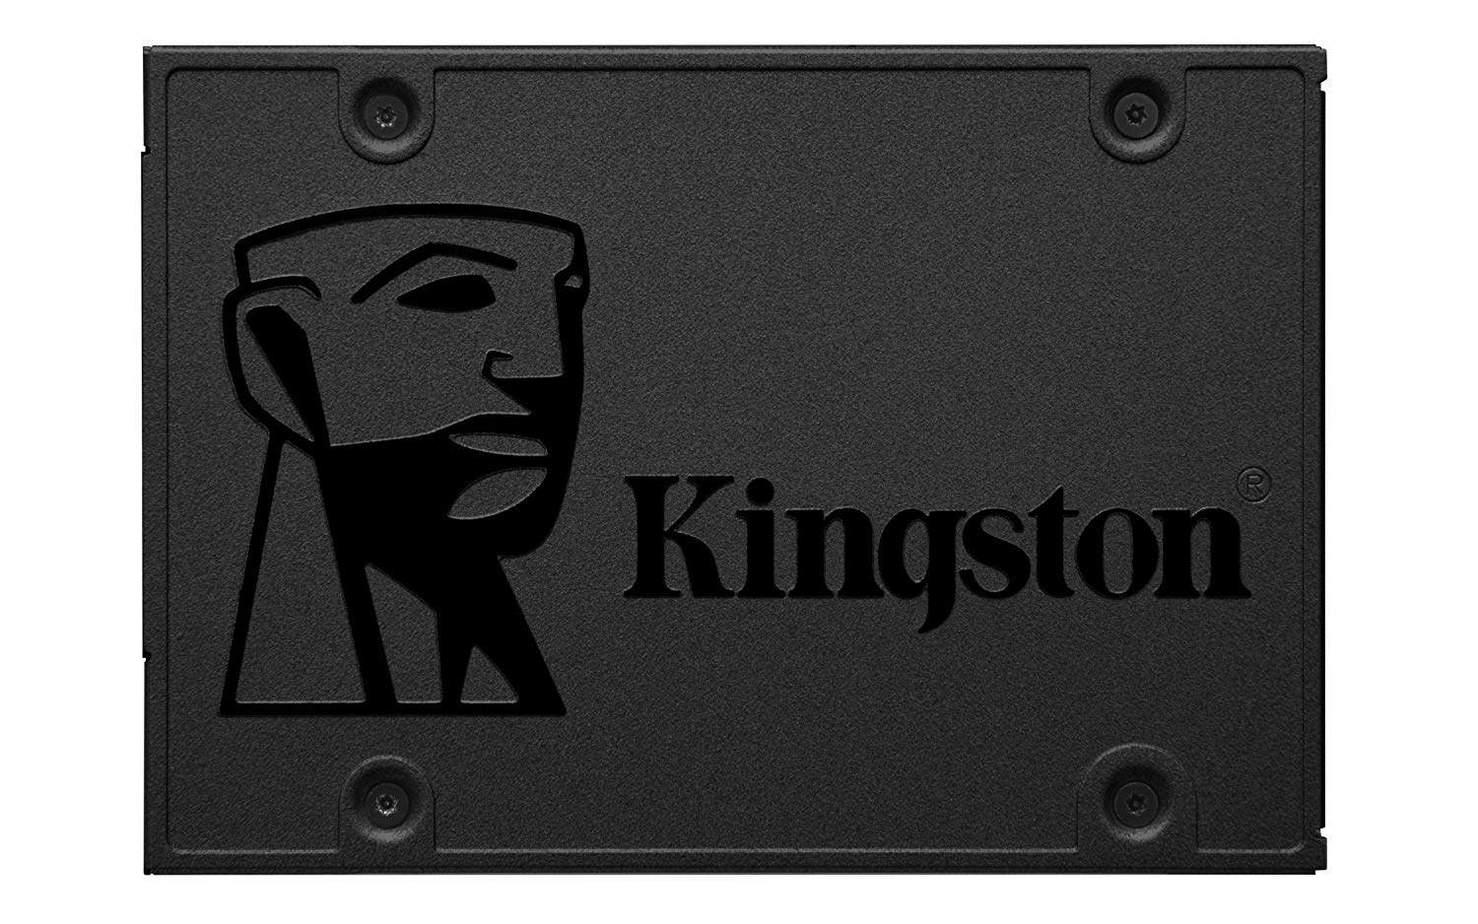 Kingston A400 240 GB SSD